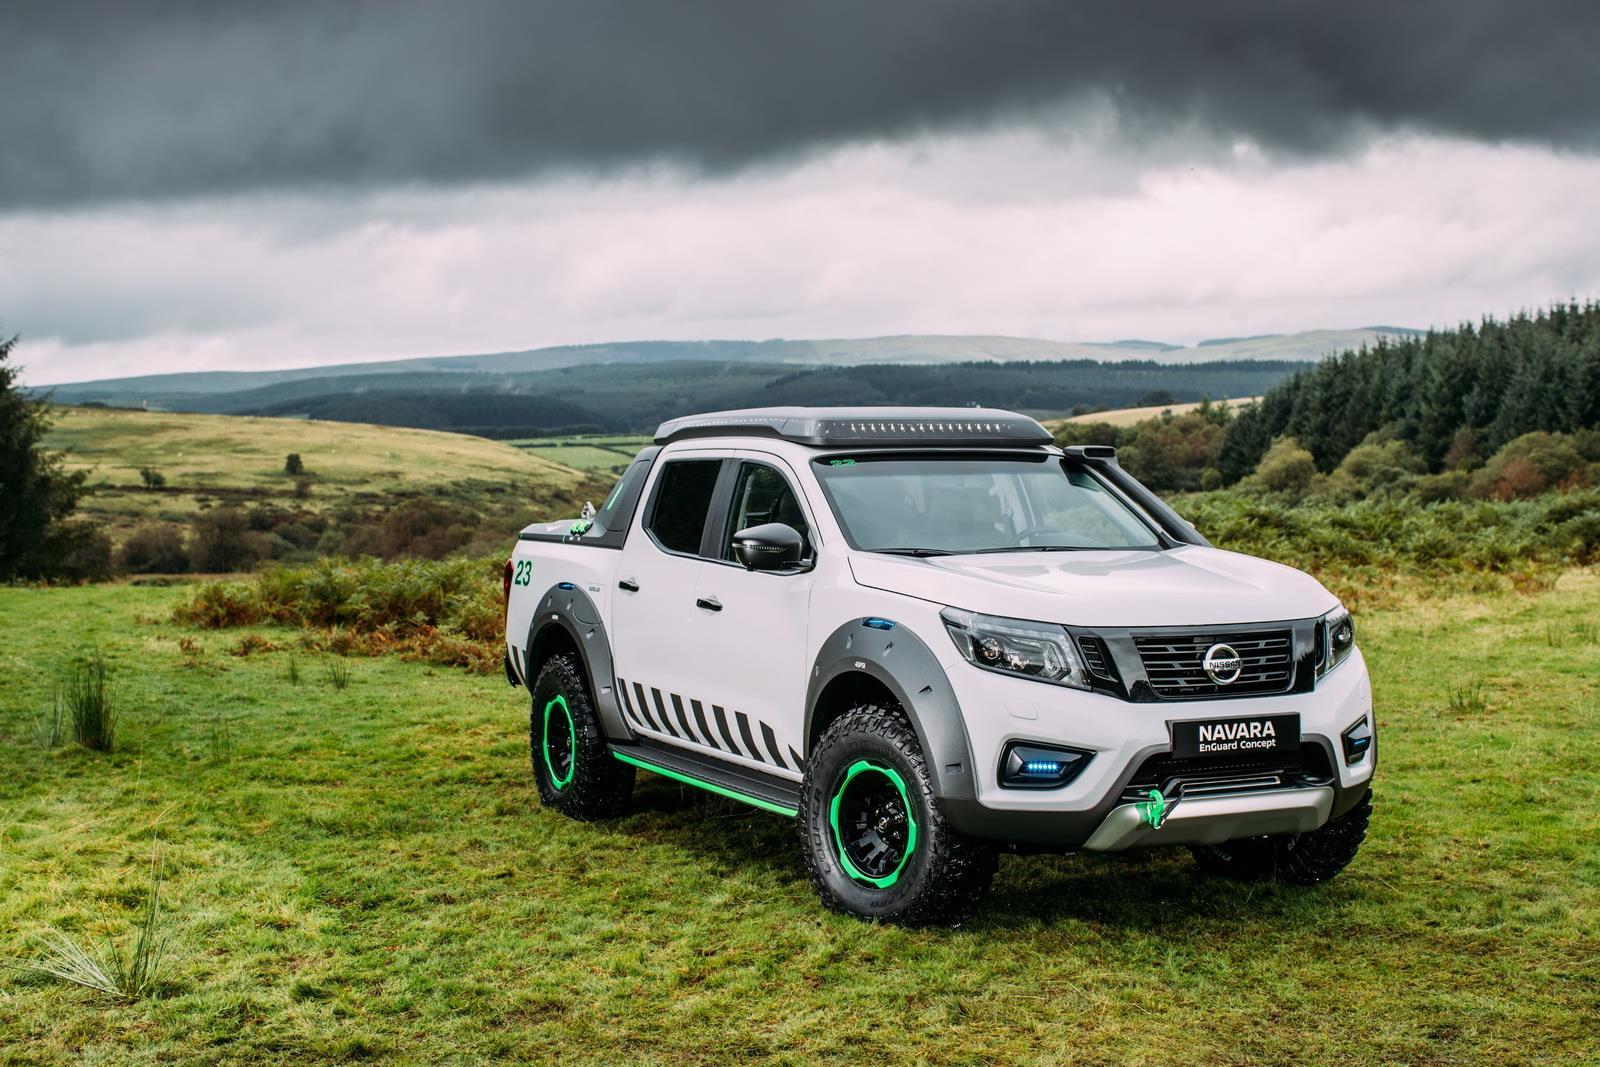 Nissan Navara EnGuard Concept photo gallery